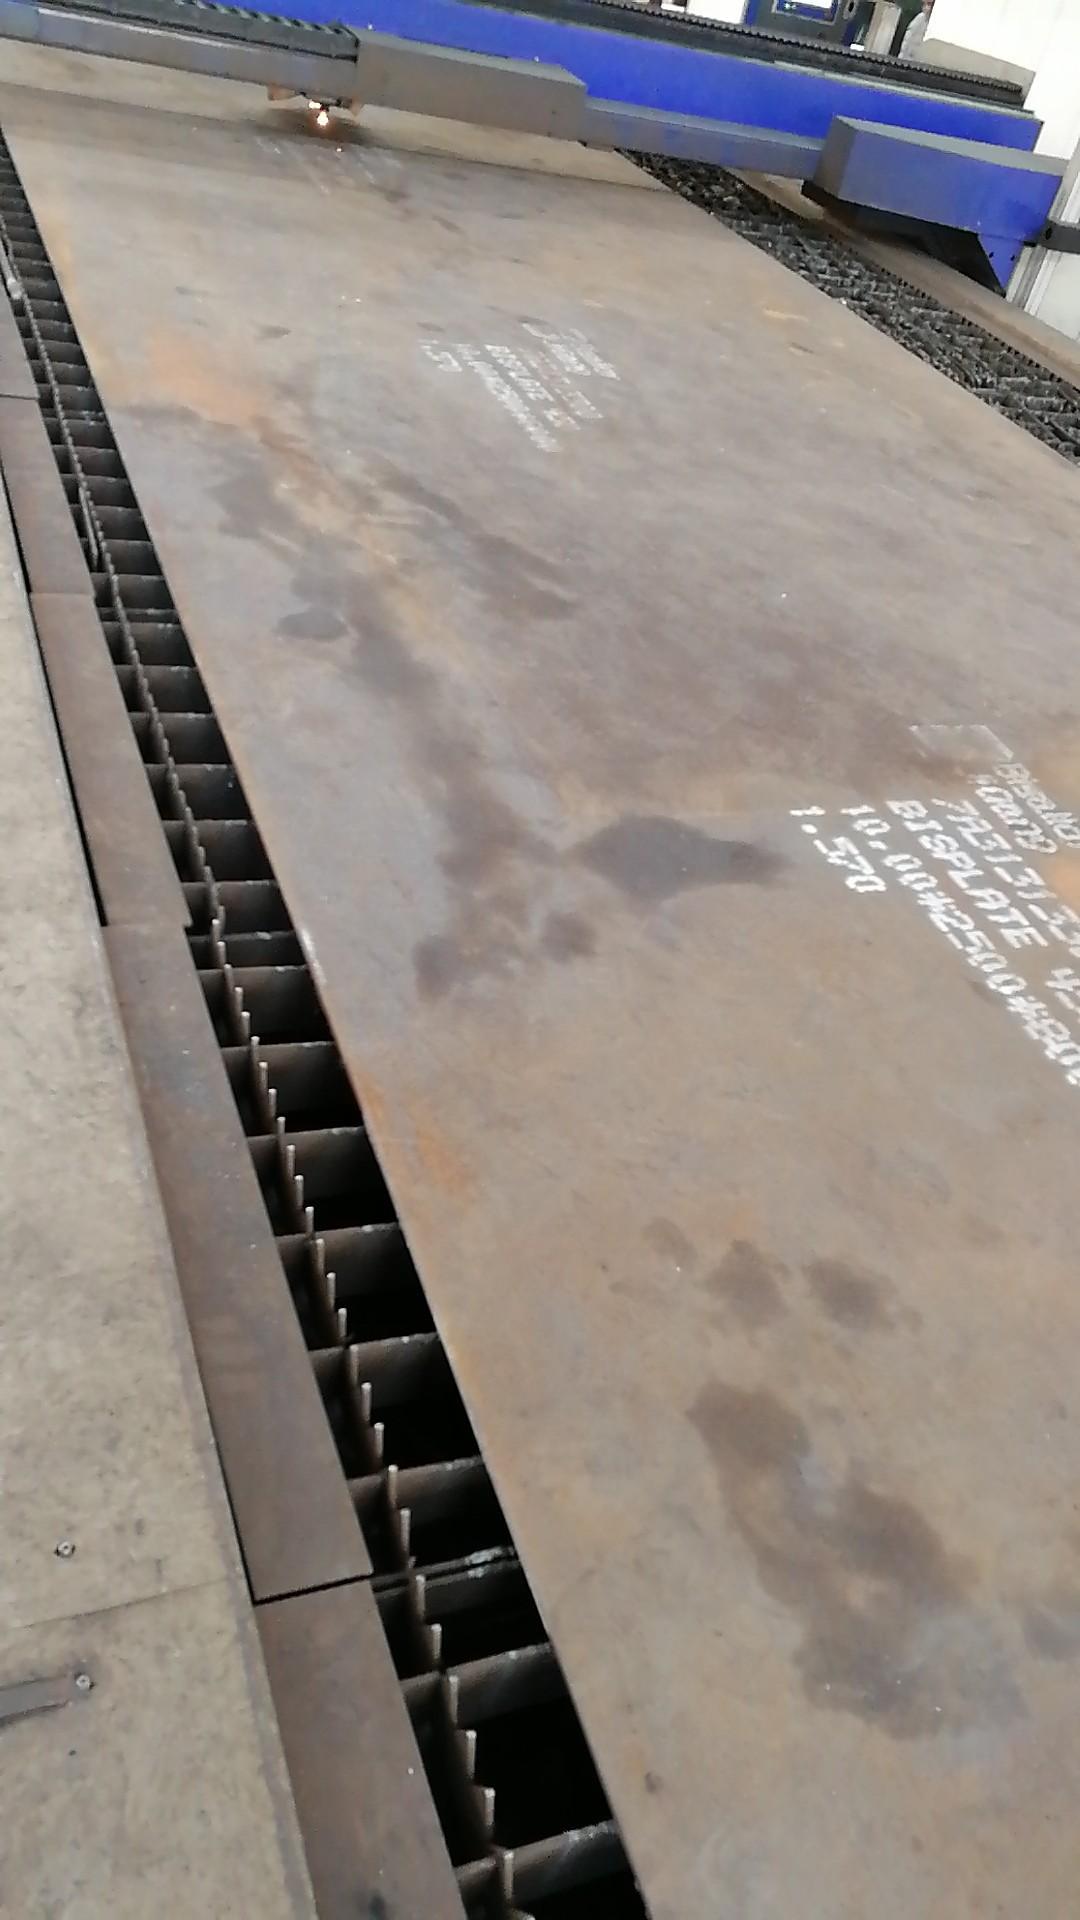 Wear-resistant steel parts 7